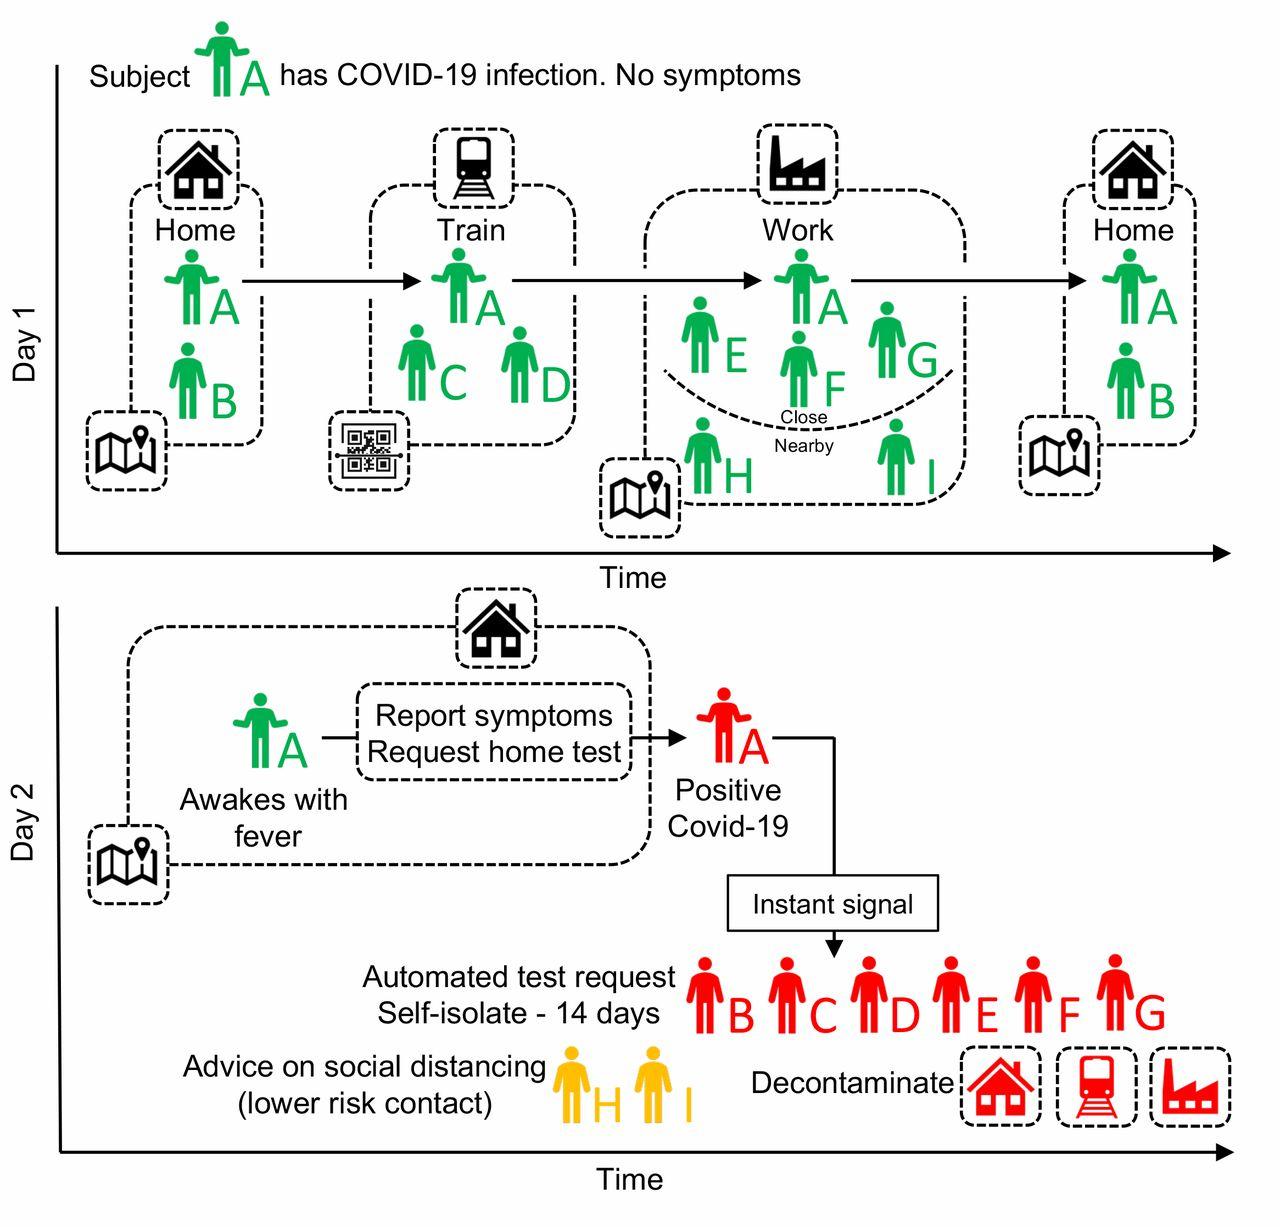 Digital Contact Tracing - Wikipedia